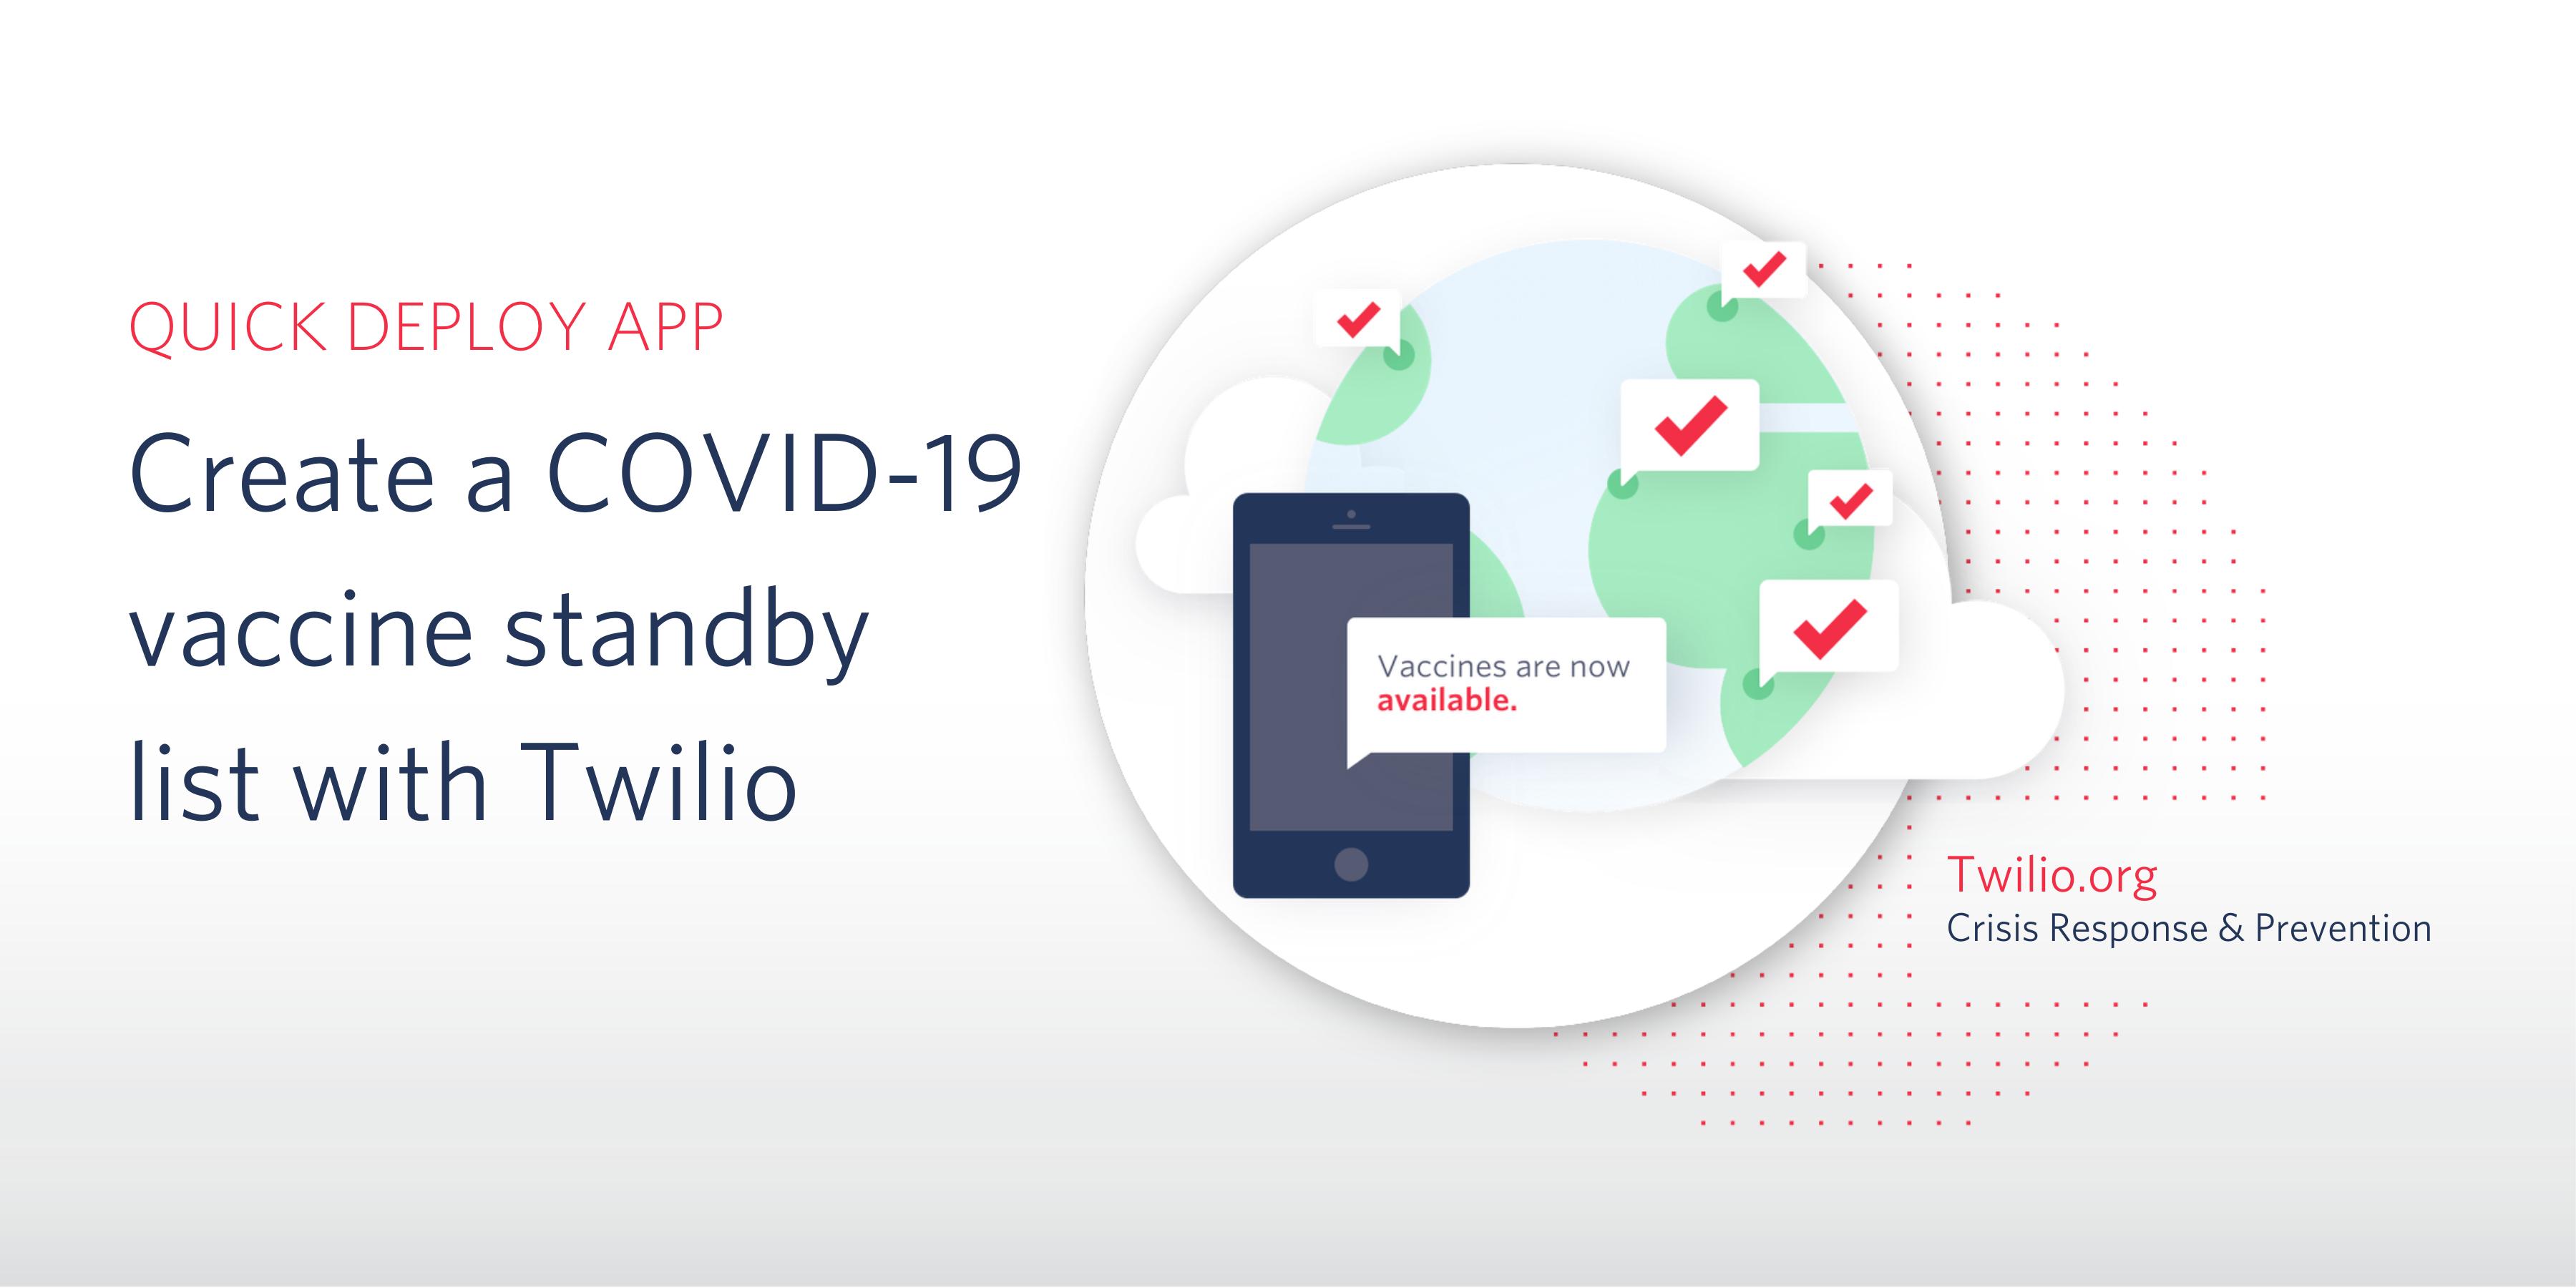 Create a COVID-19 vaccine standby list with Twilio - Twilio